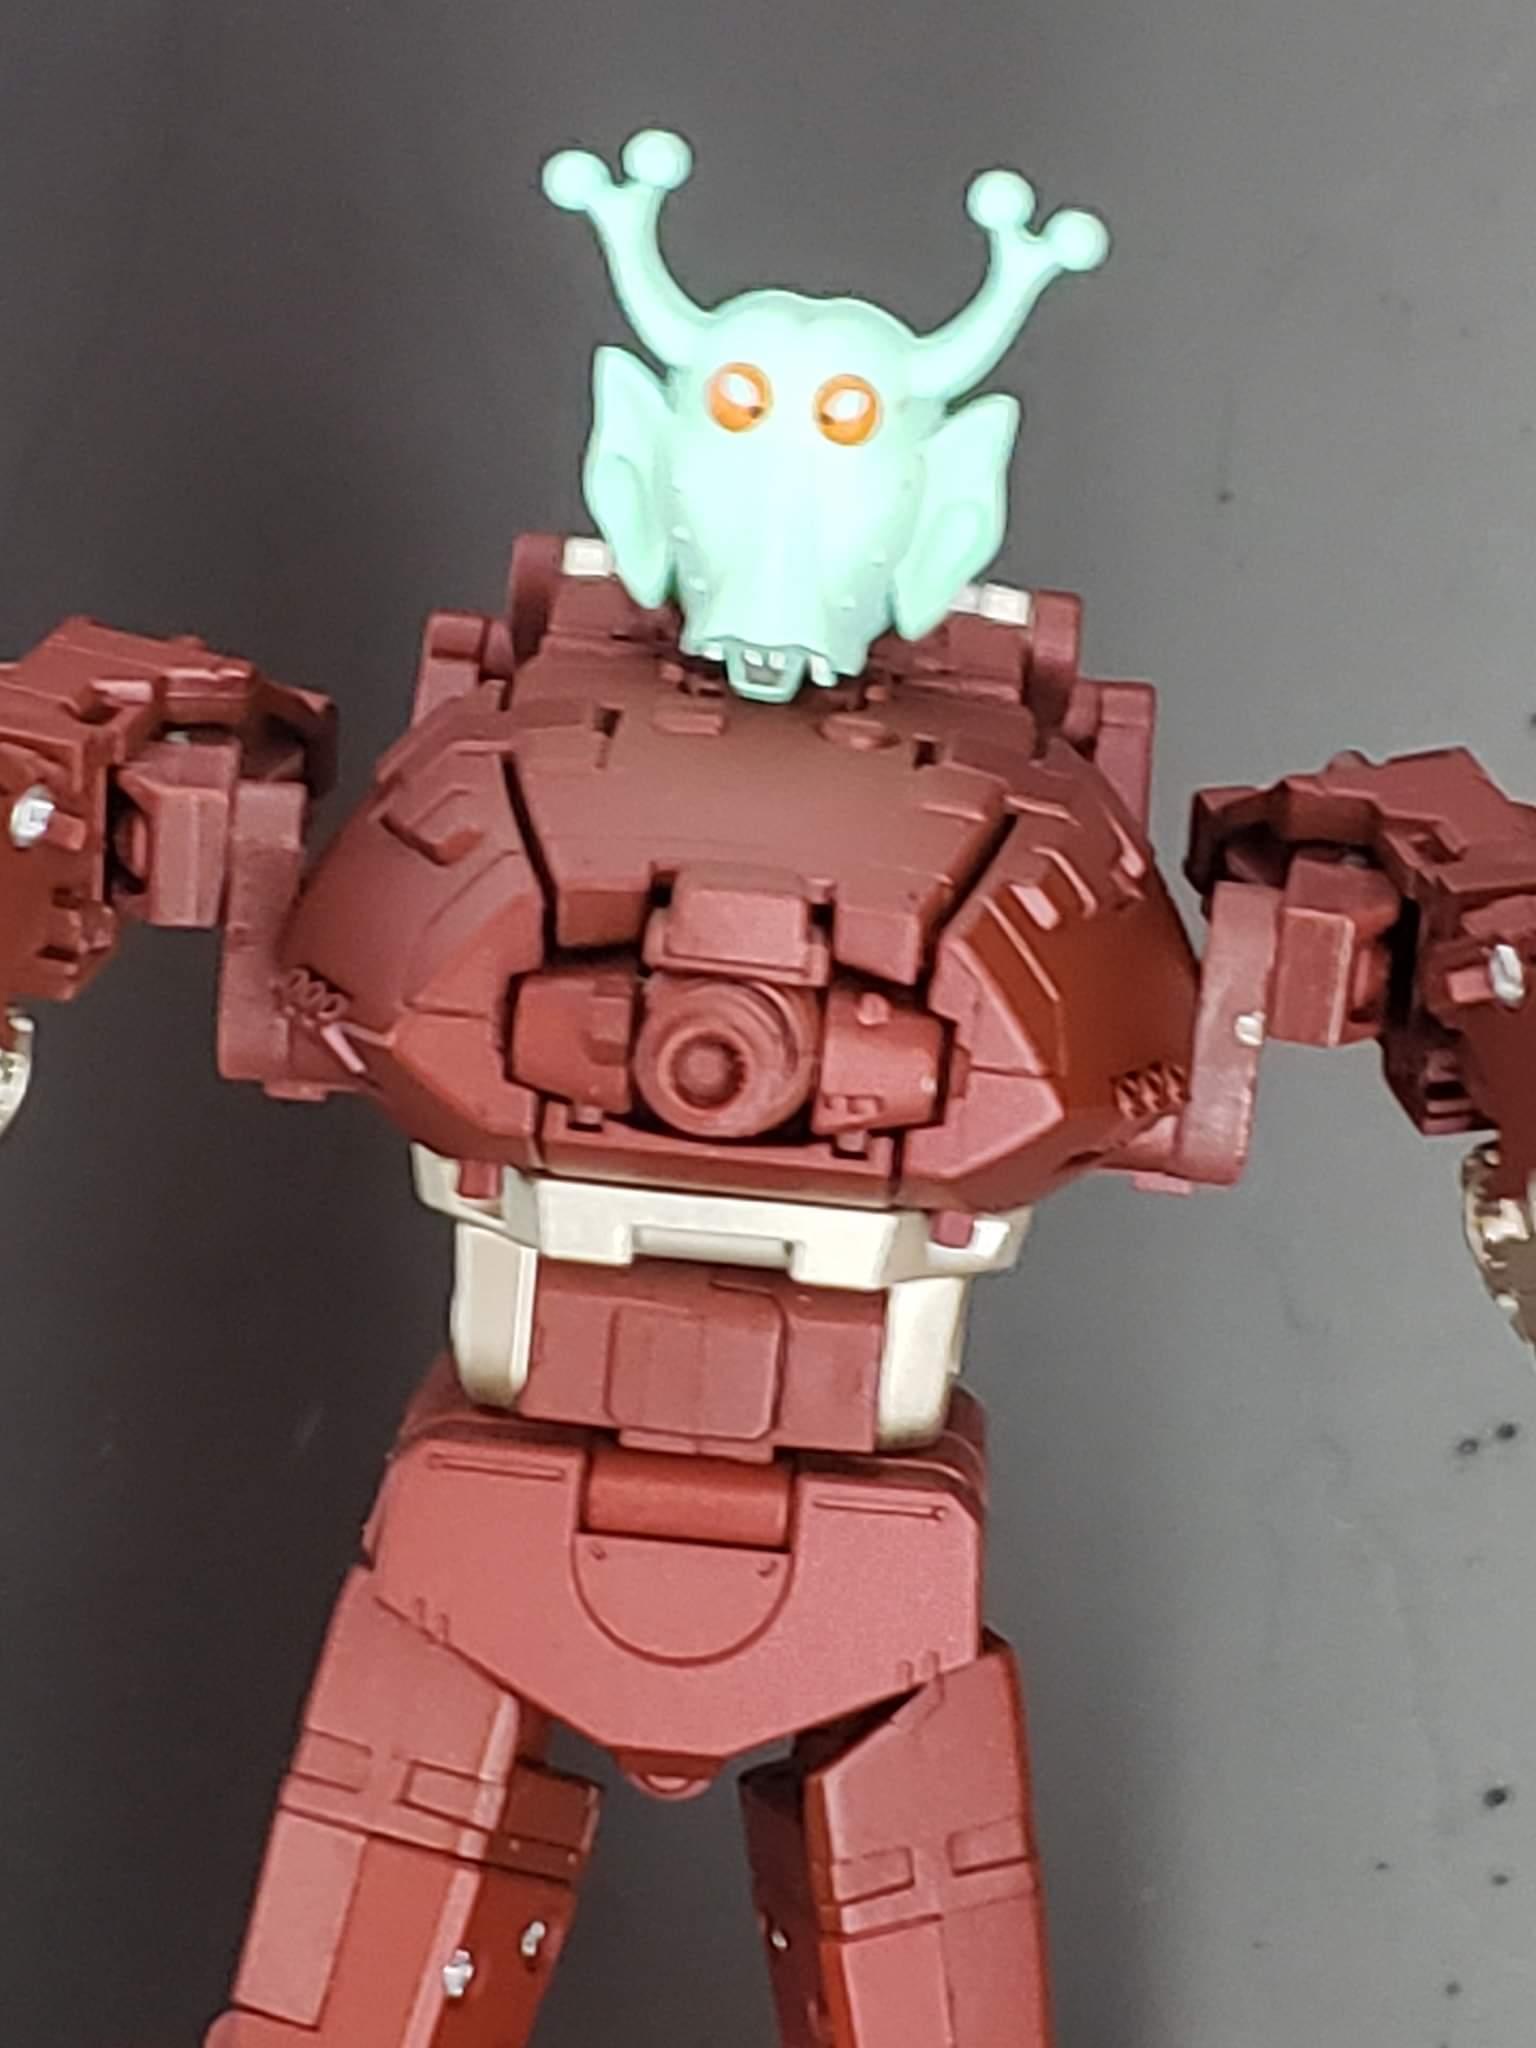 [Fanstoys] Produit Tiers - Minibots MP - Gamme FT - Page 4 U7aPPkvk_o